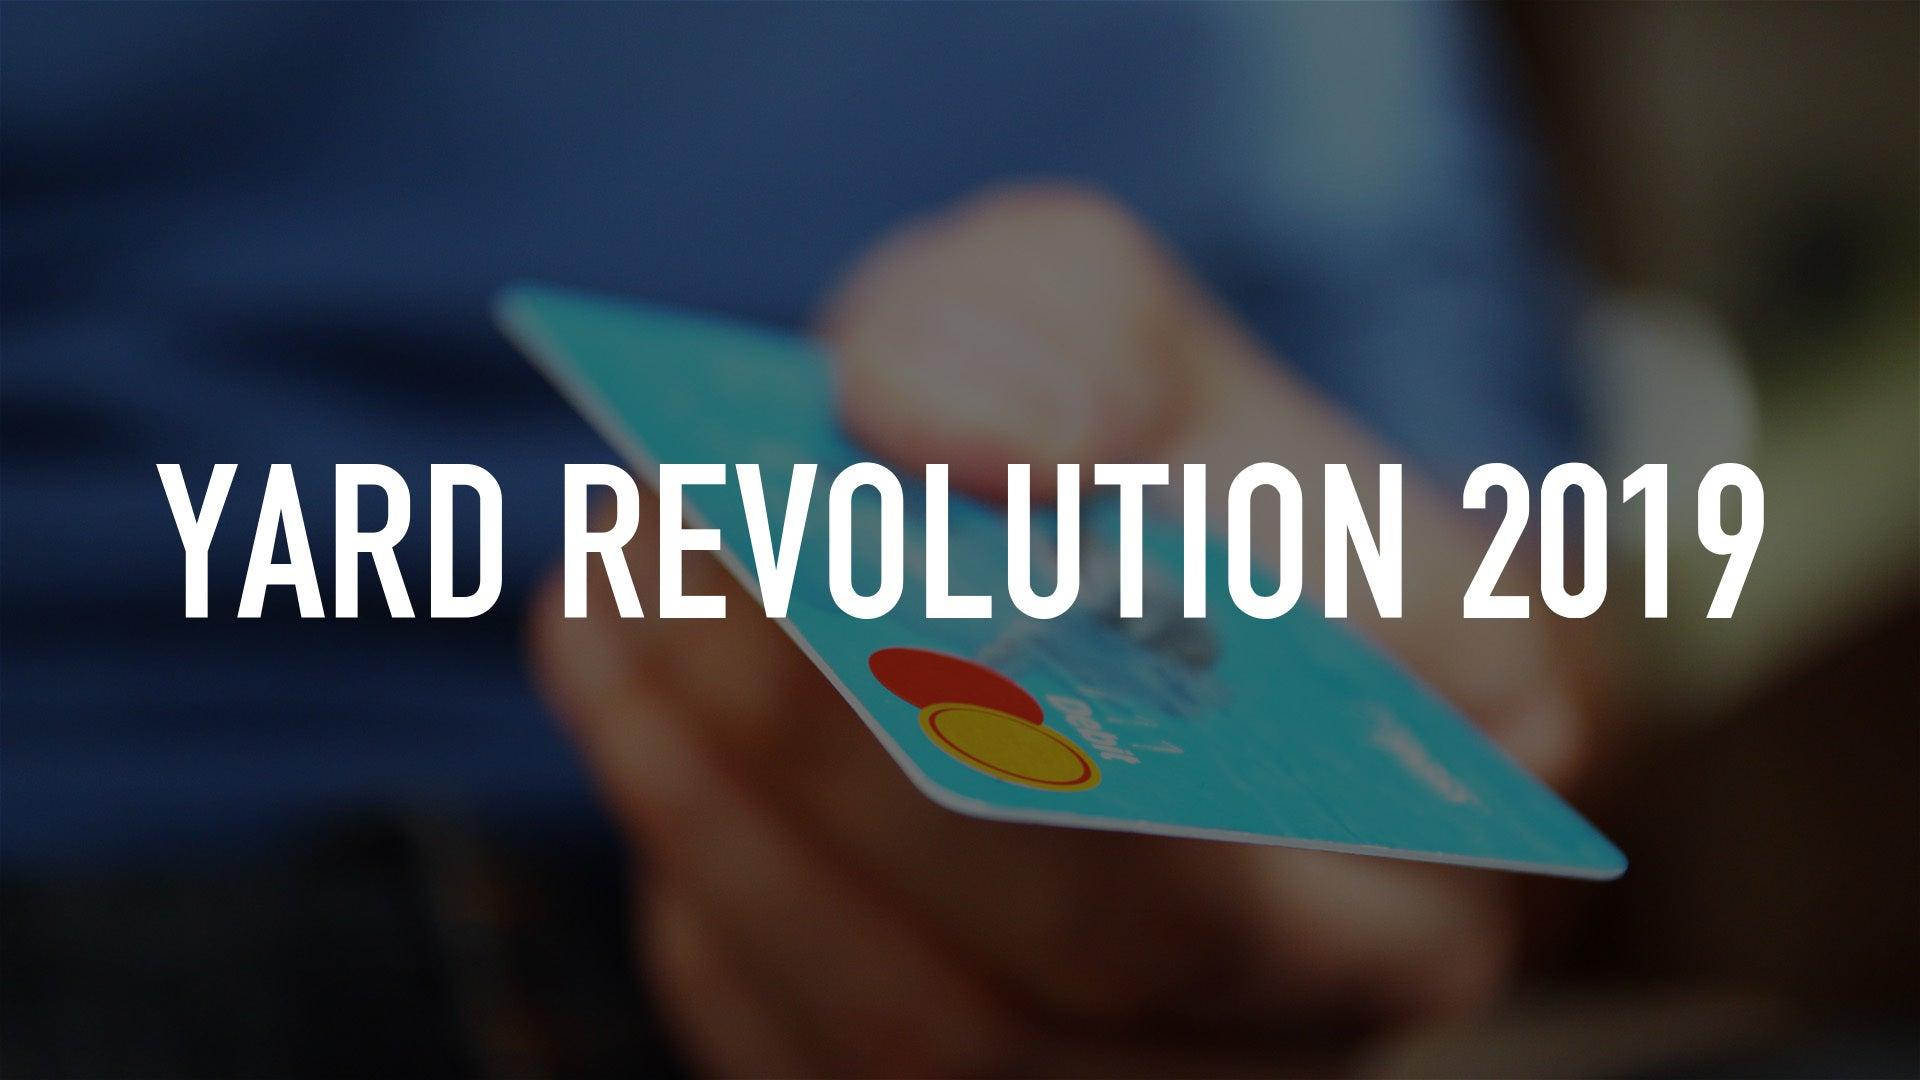 Yard Revolution 2019